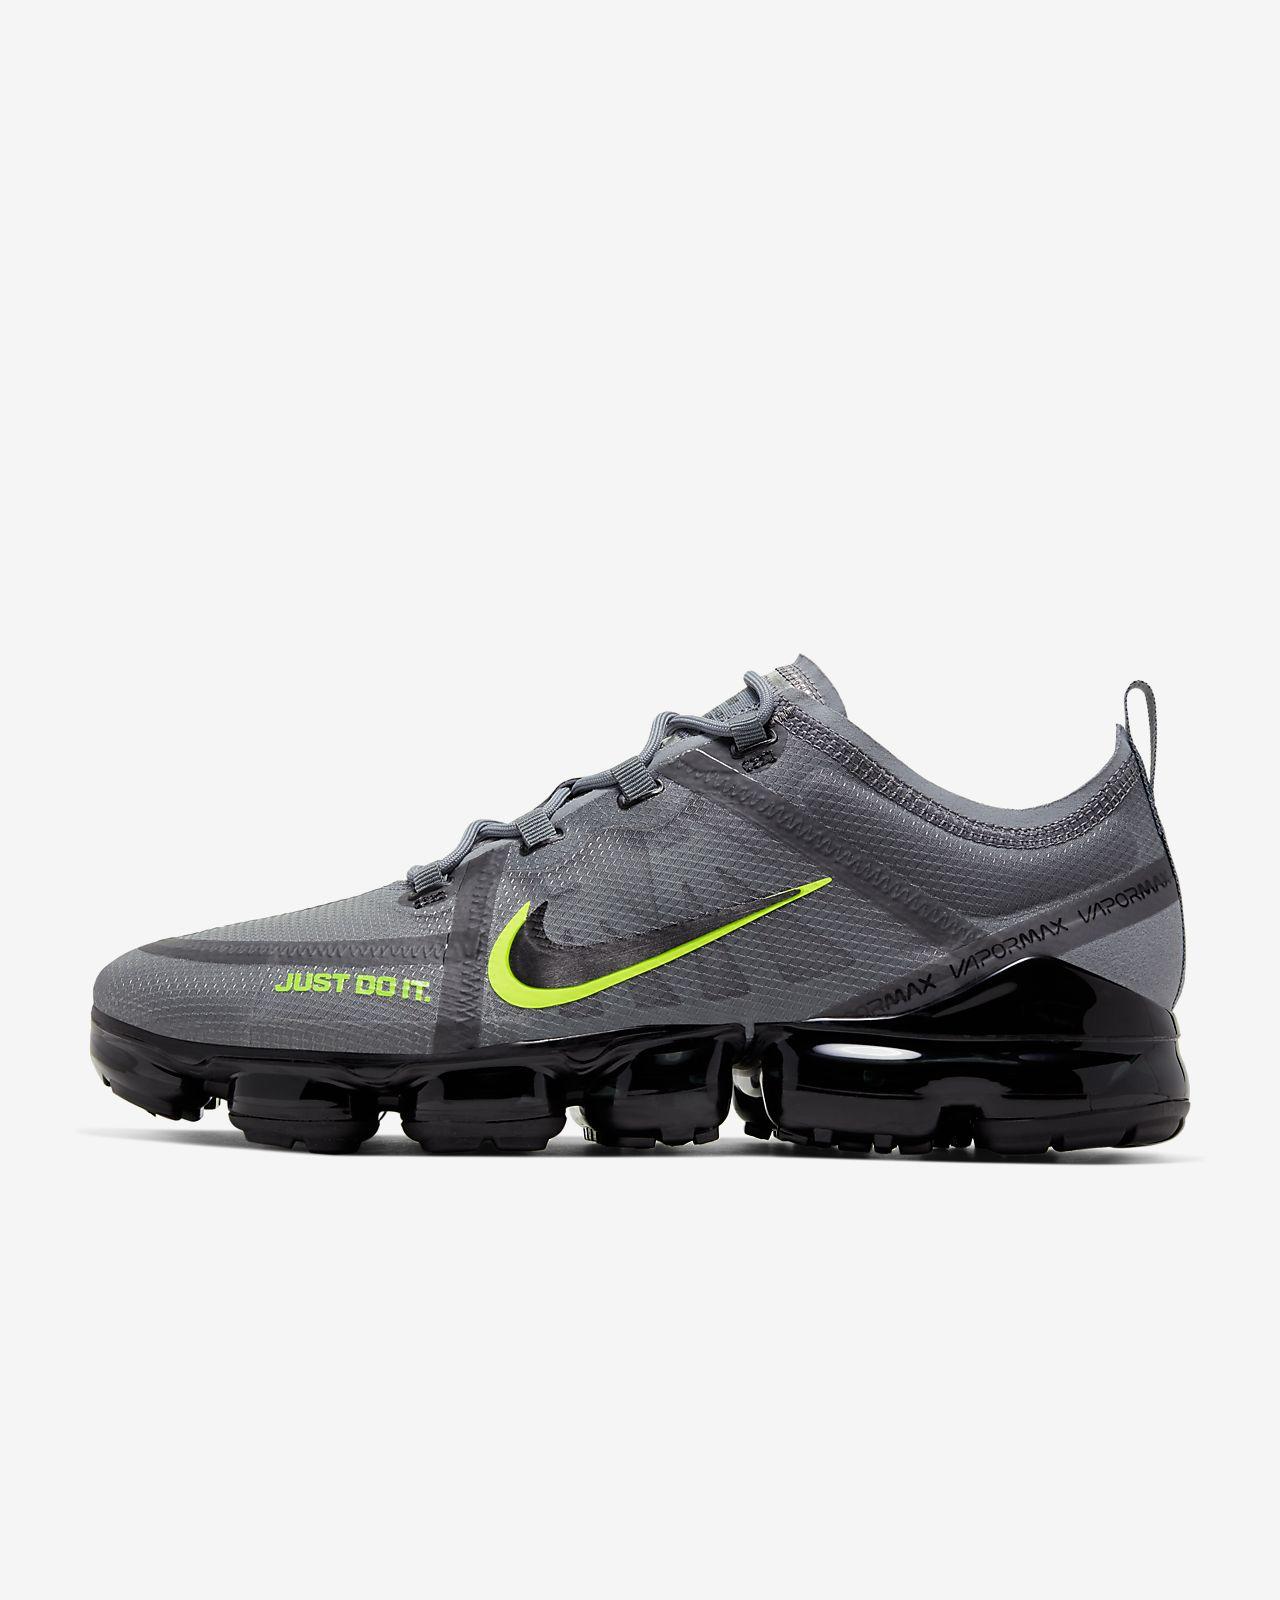 Nike Air VaporMax 2019 DRT Men's Shoe